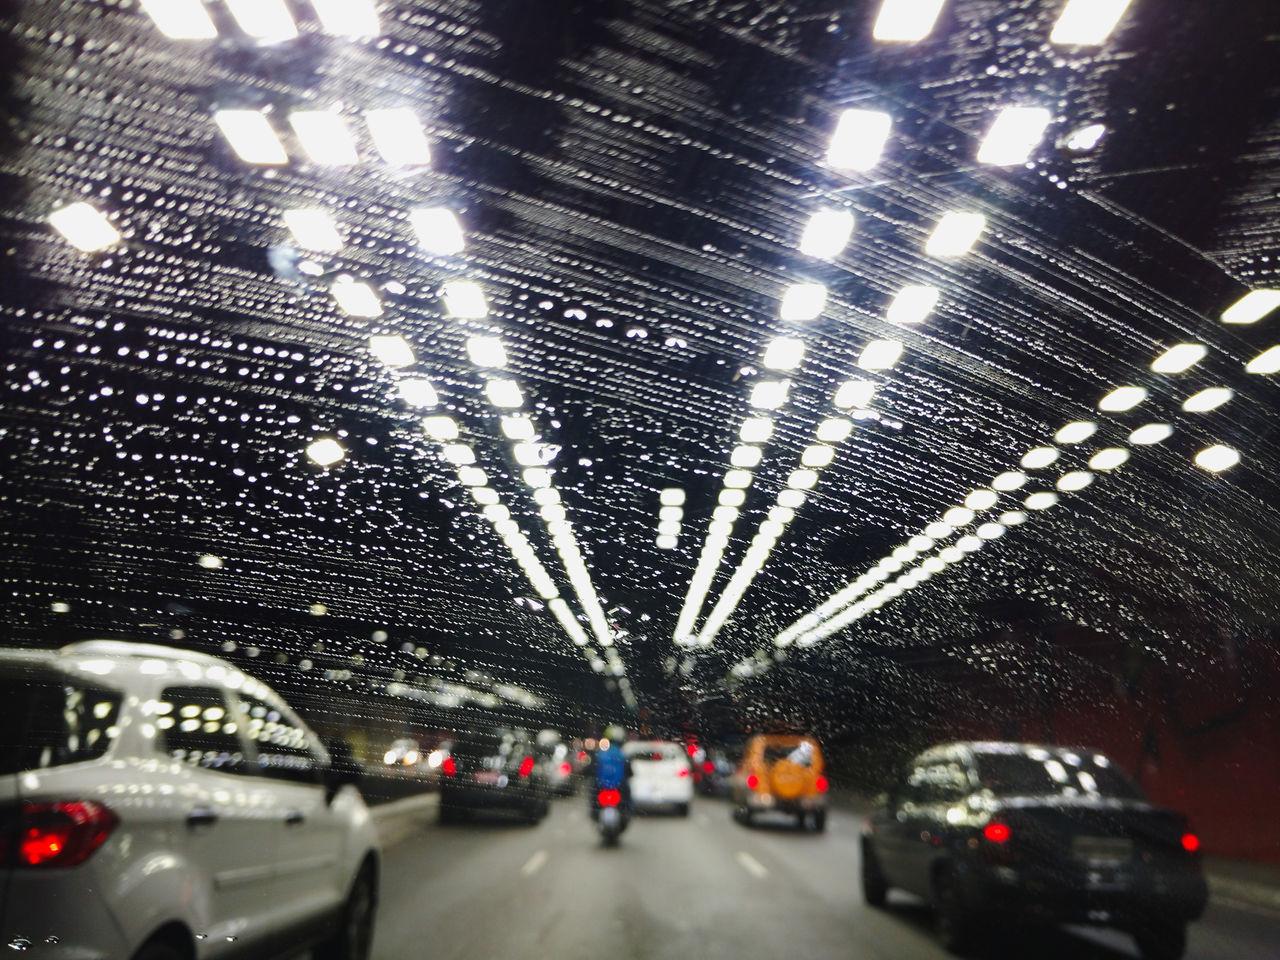 car, transportation, illuminated, land vehicle, mode of transport, lighting equipment, indoors, night, real people, architecture, close-up